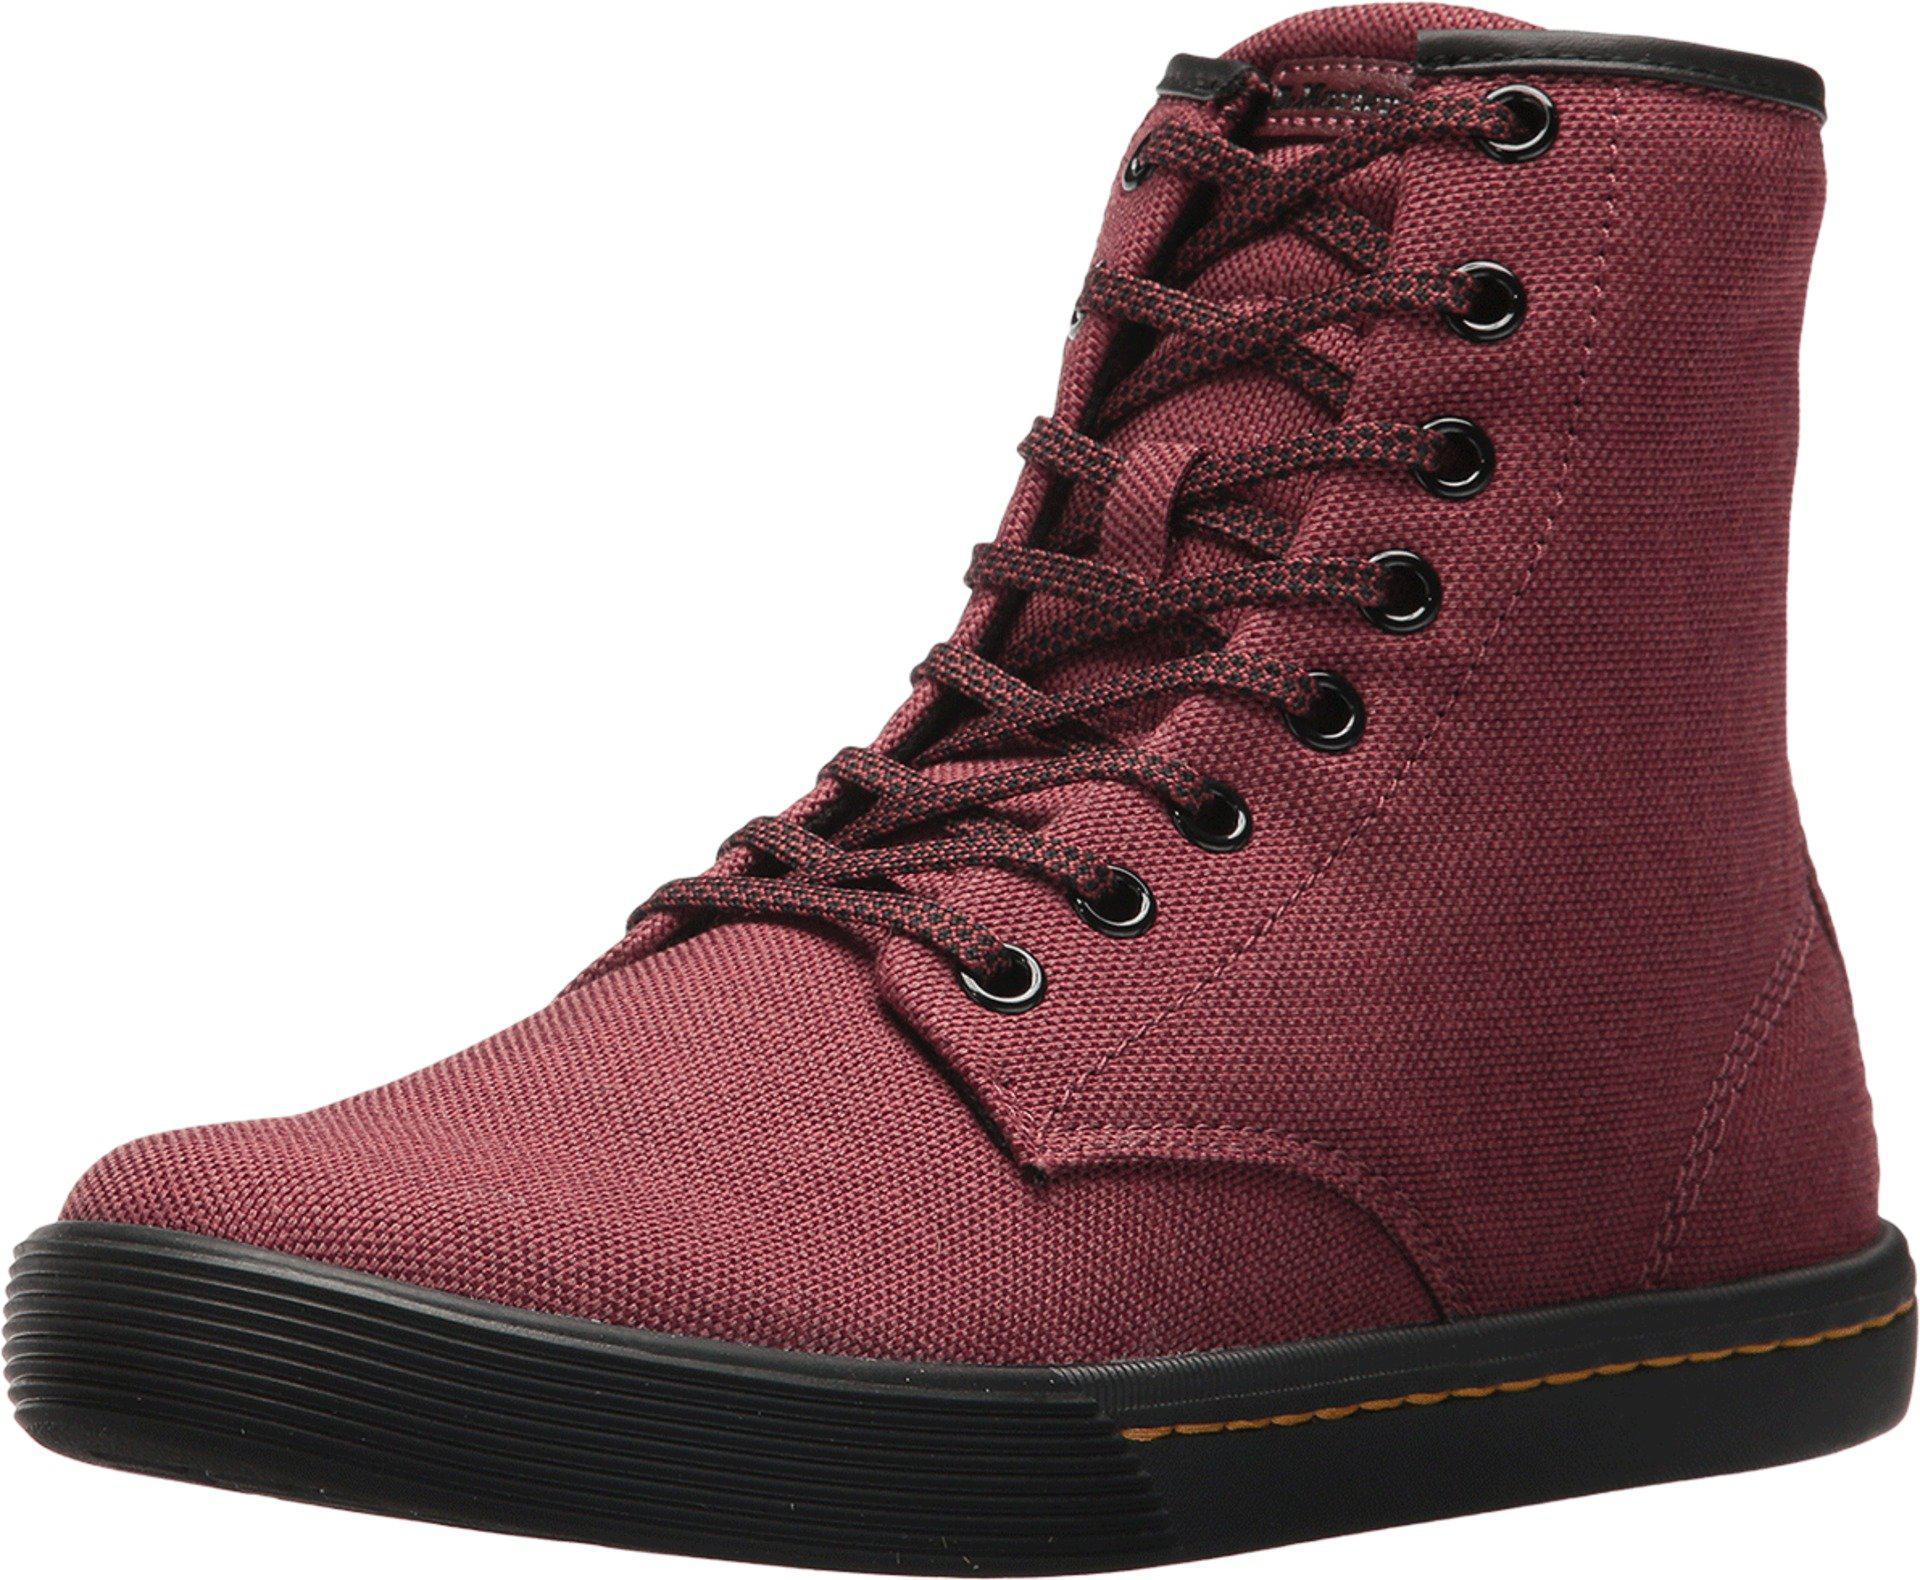 Lyst - Dr. Martens Sheridan in Red  adidas Style Essentials 900 MID ... 11ebf69f6f